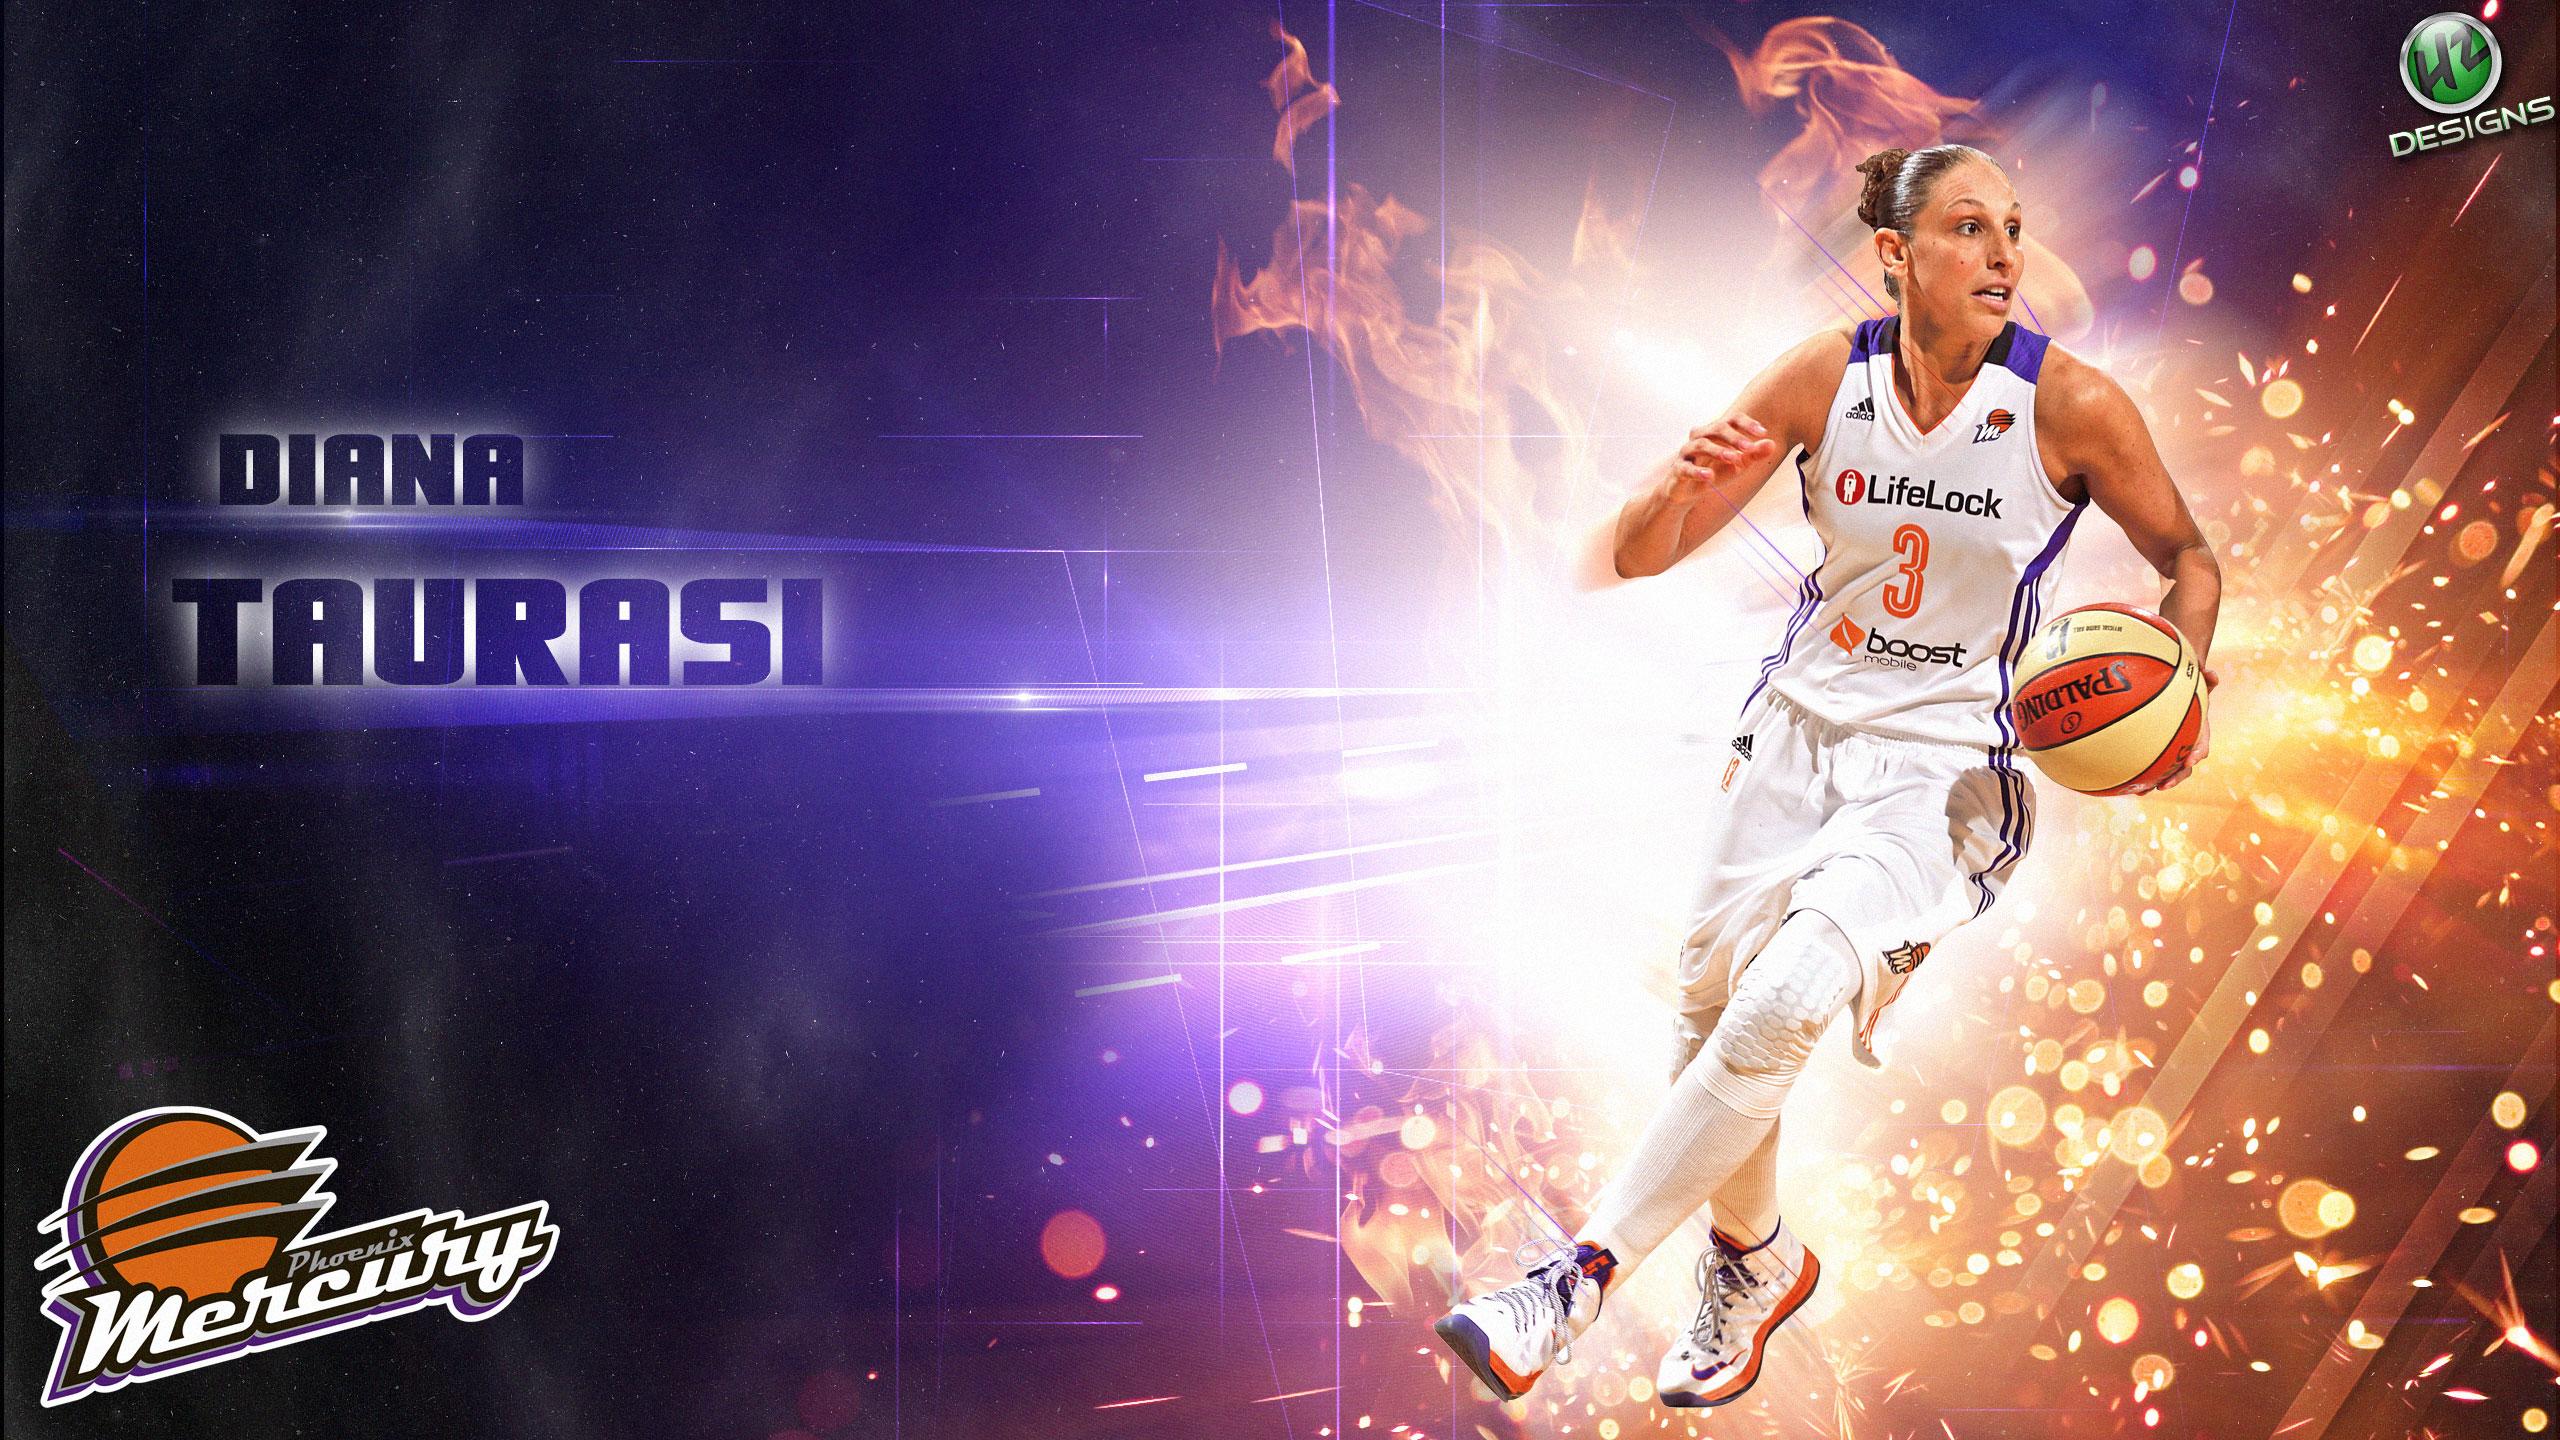 WNBA Wallpapers Basketball Wallpapers at